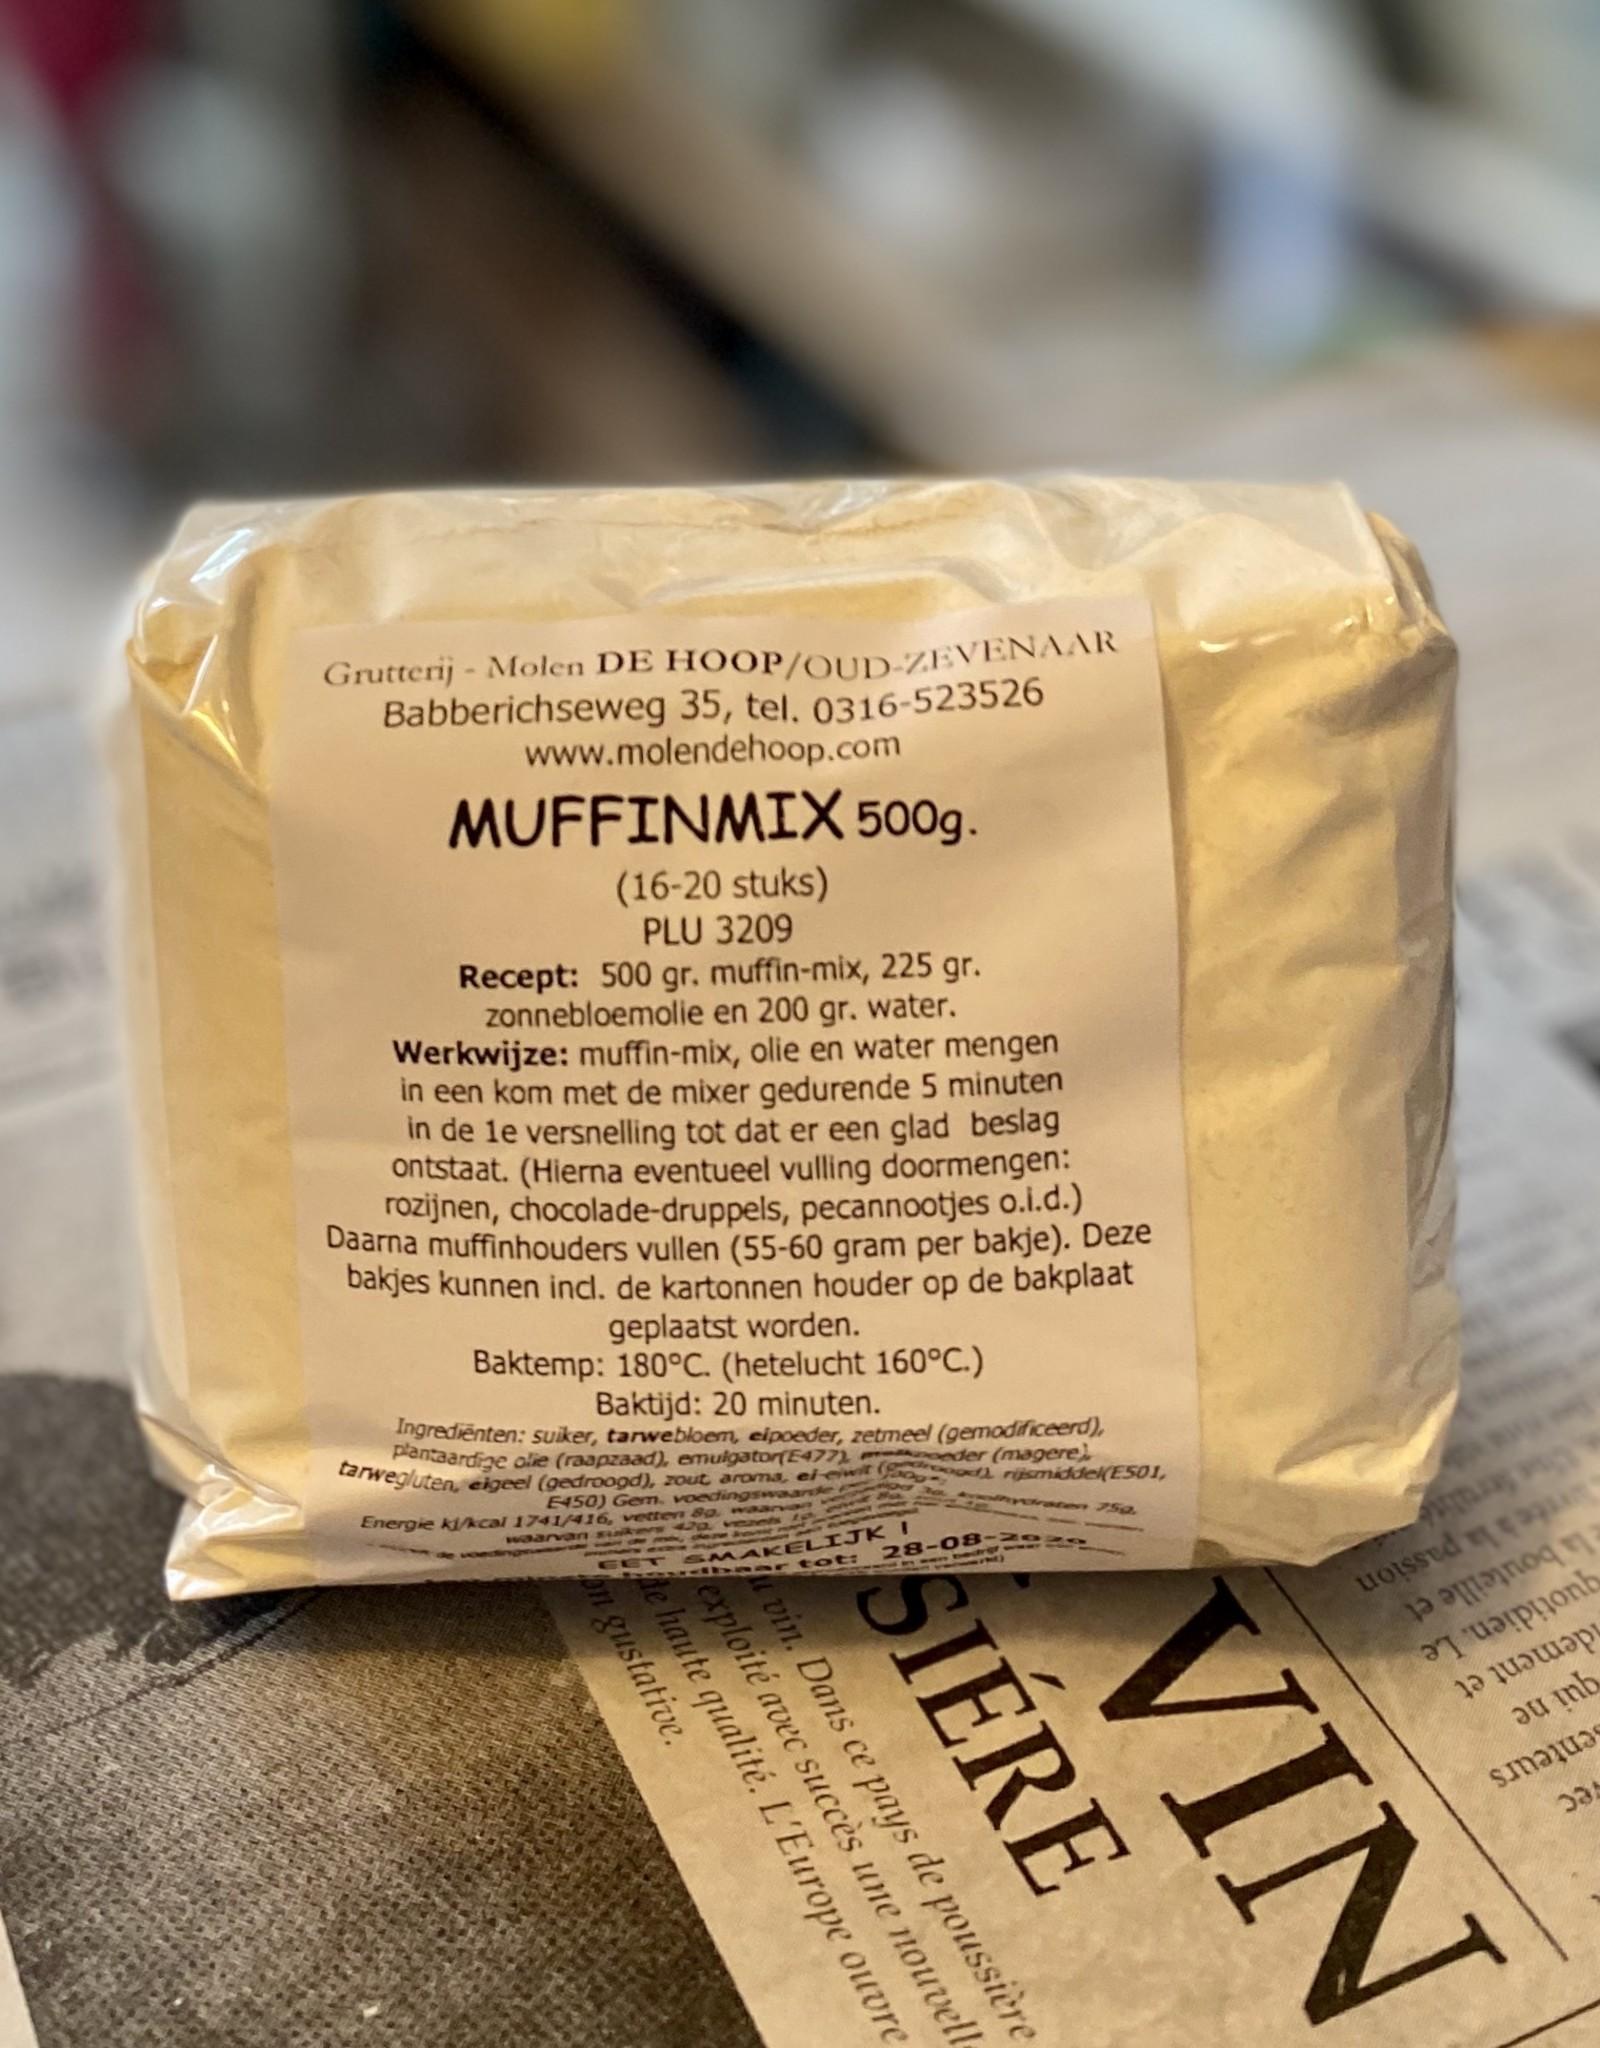 Grutterij Molen de Hoop Muffinmix